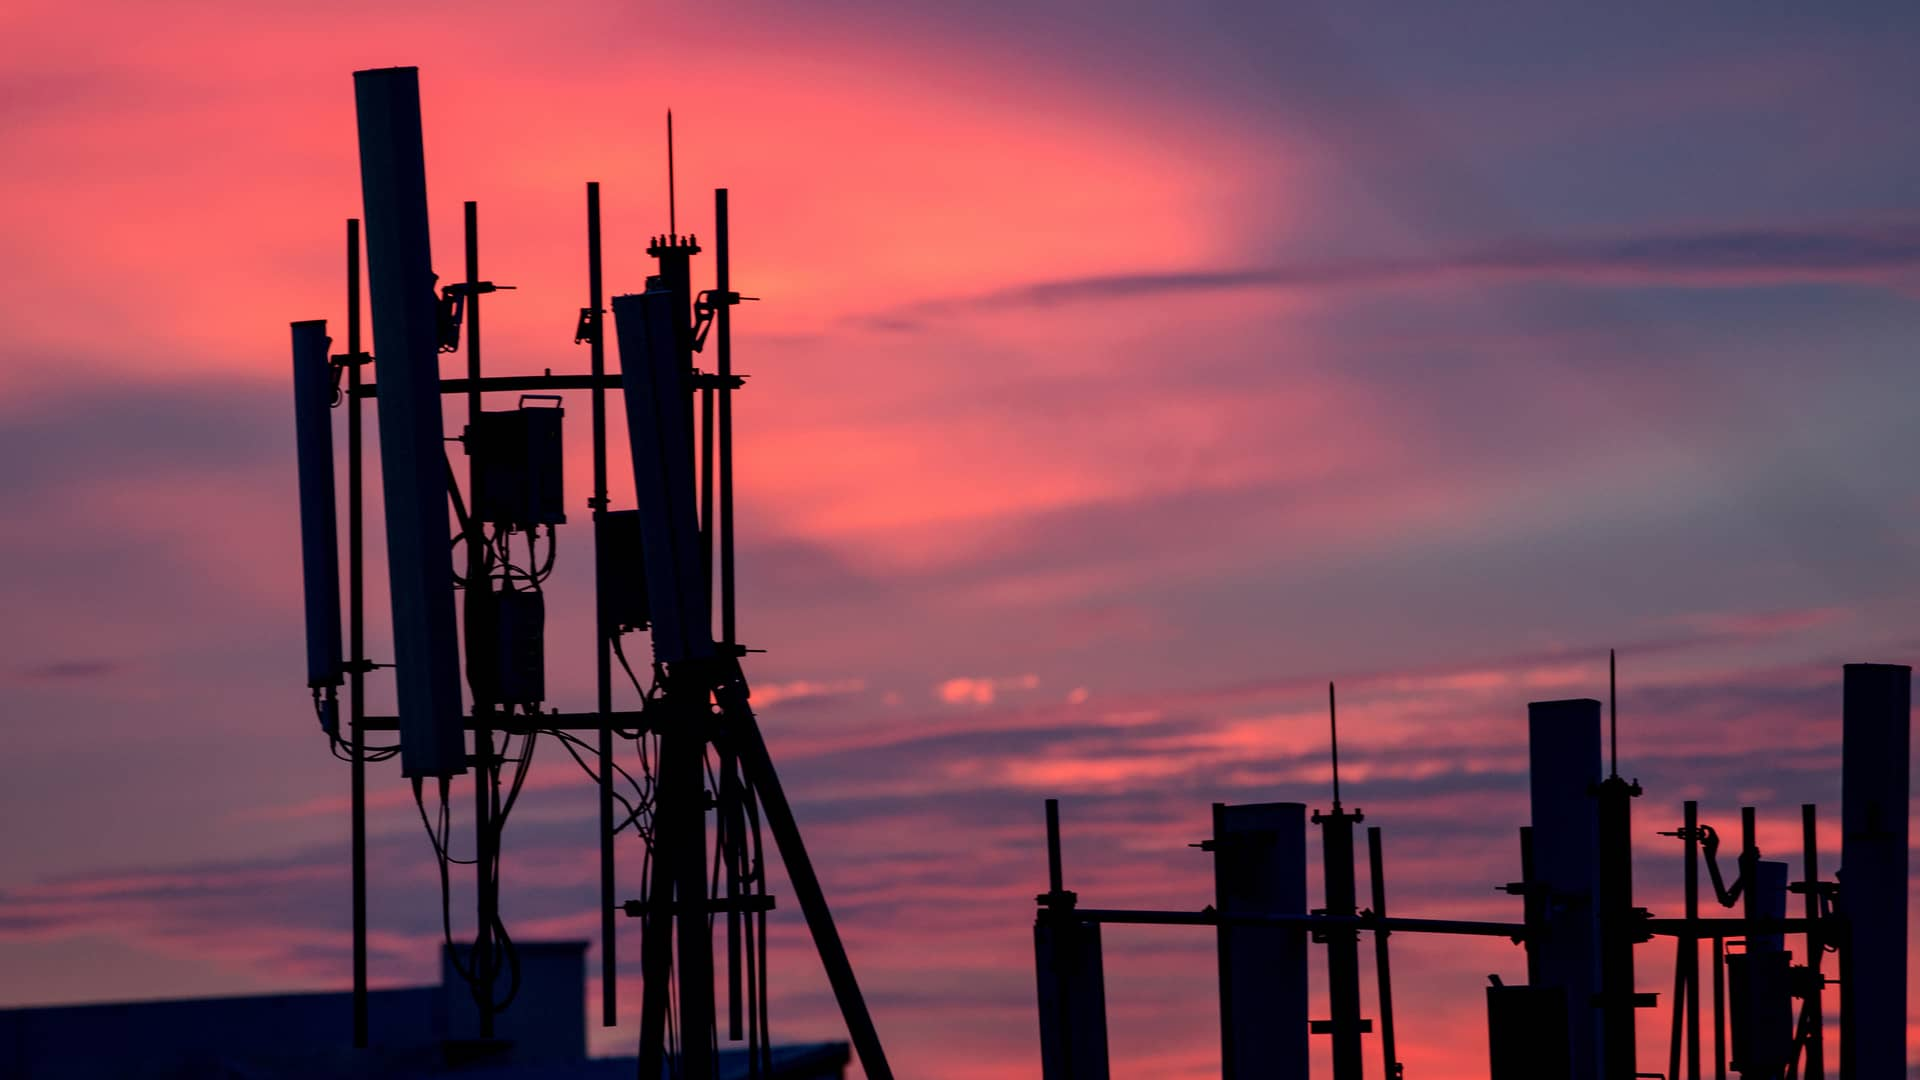 Antena telefónica al atardecer simboliza cobertura finetwork